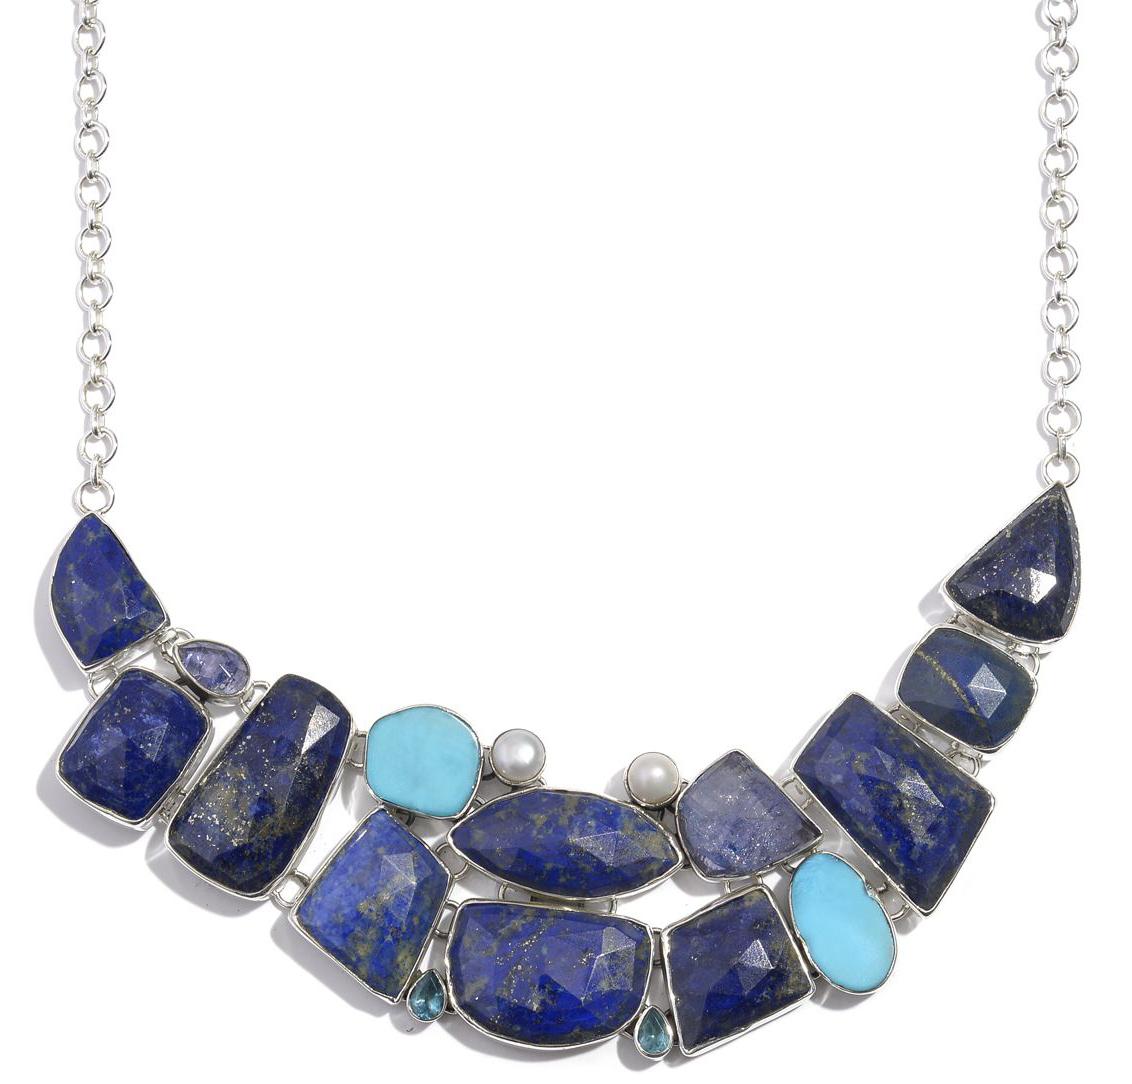 Fashion Week Roundup Jewelry - Artisan Crafted Lapis Lazuli, Multi Gemstone Sterling Silver Necklace